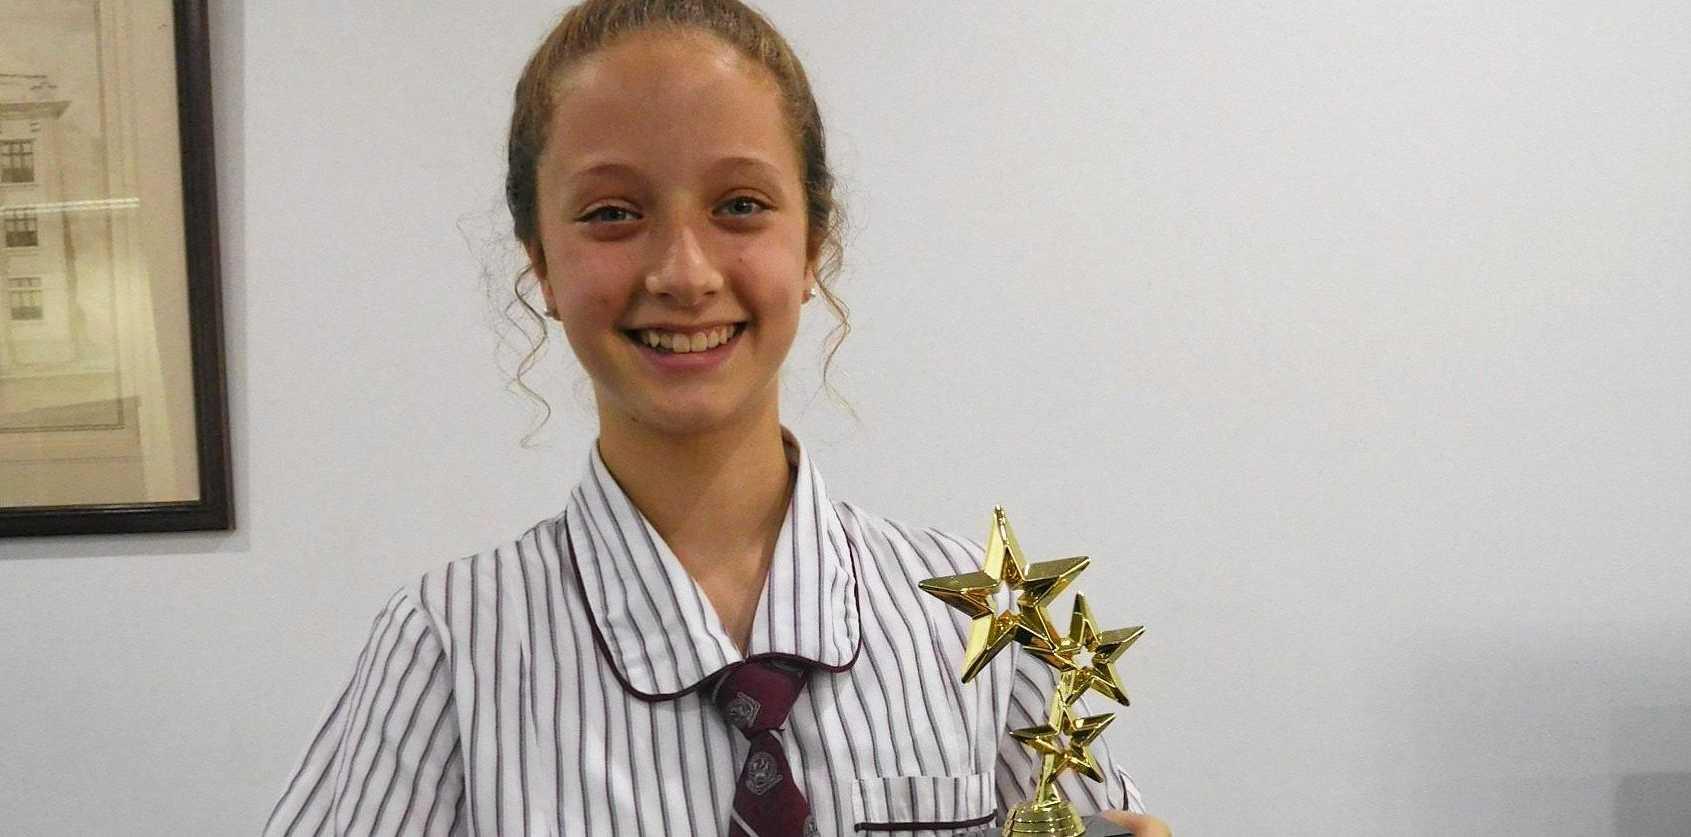 HEARTFELT TOPIC: North Rockhampton High School Year 8 student Alicia Kyriazis won the October High School Young Writer Award.